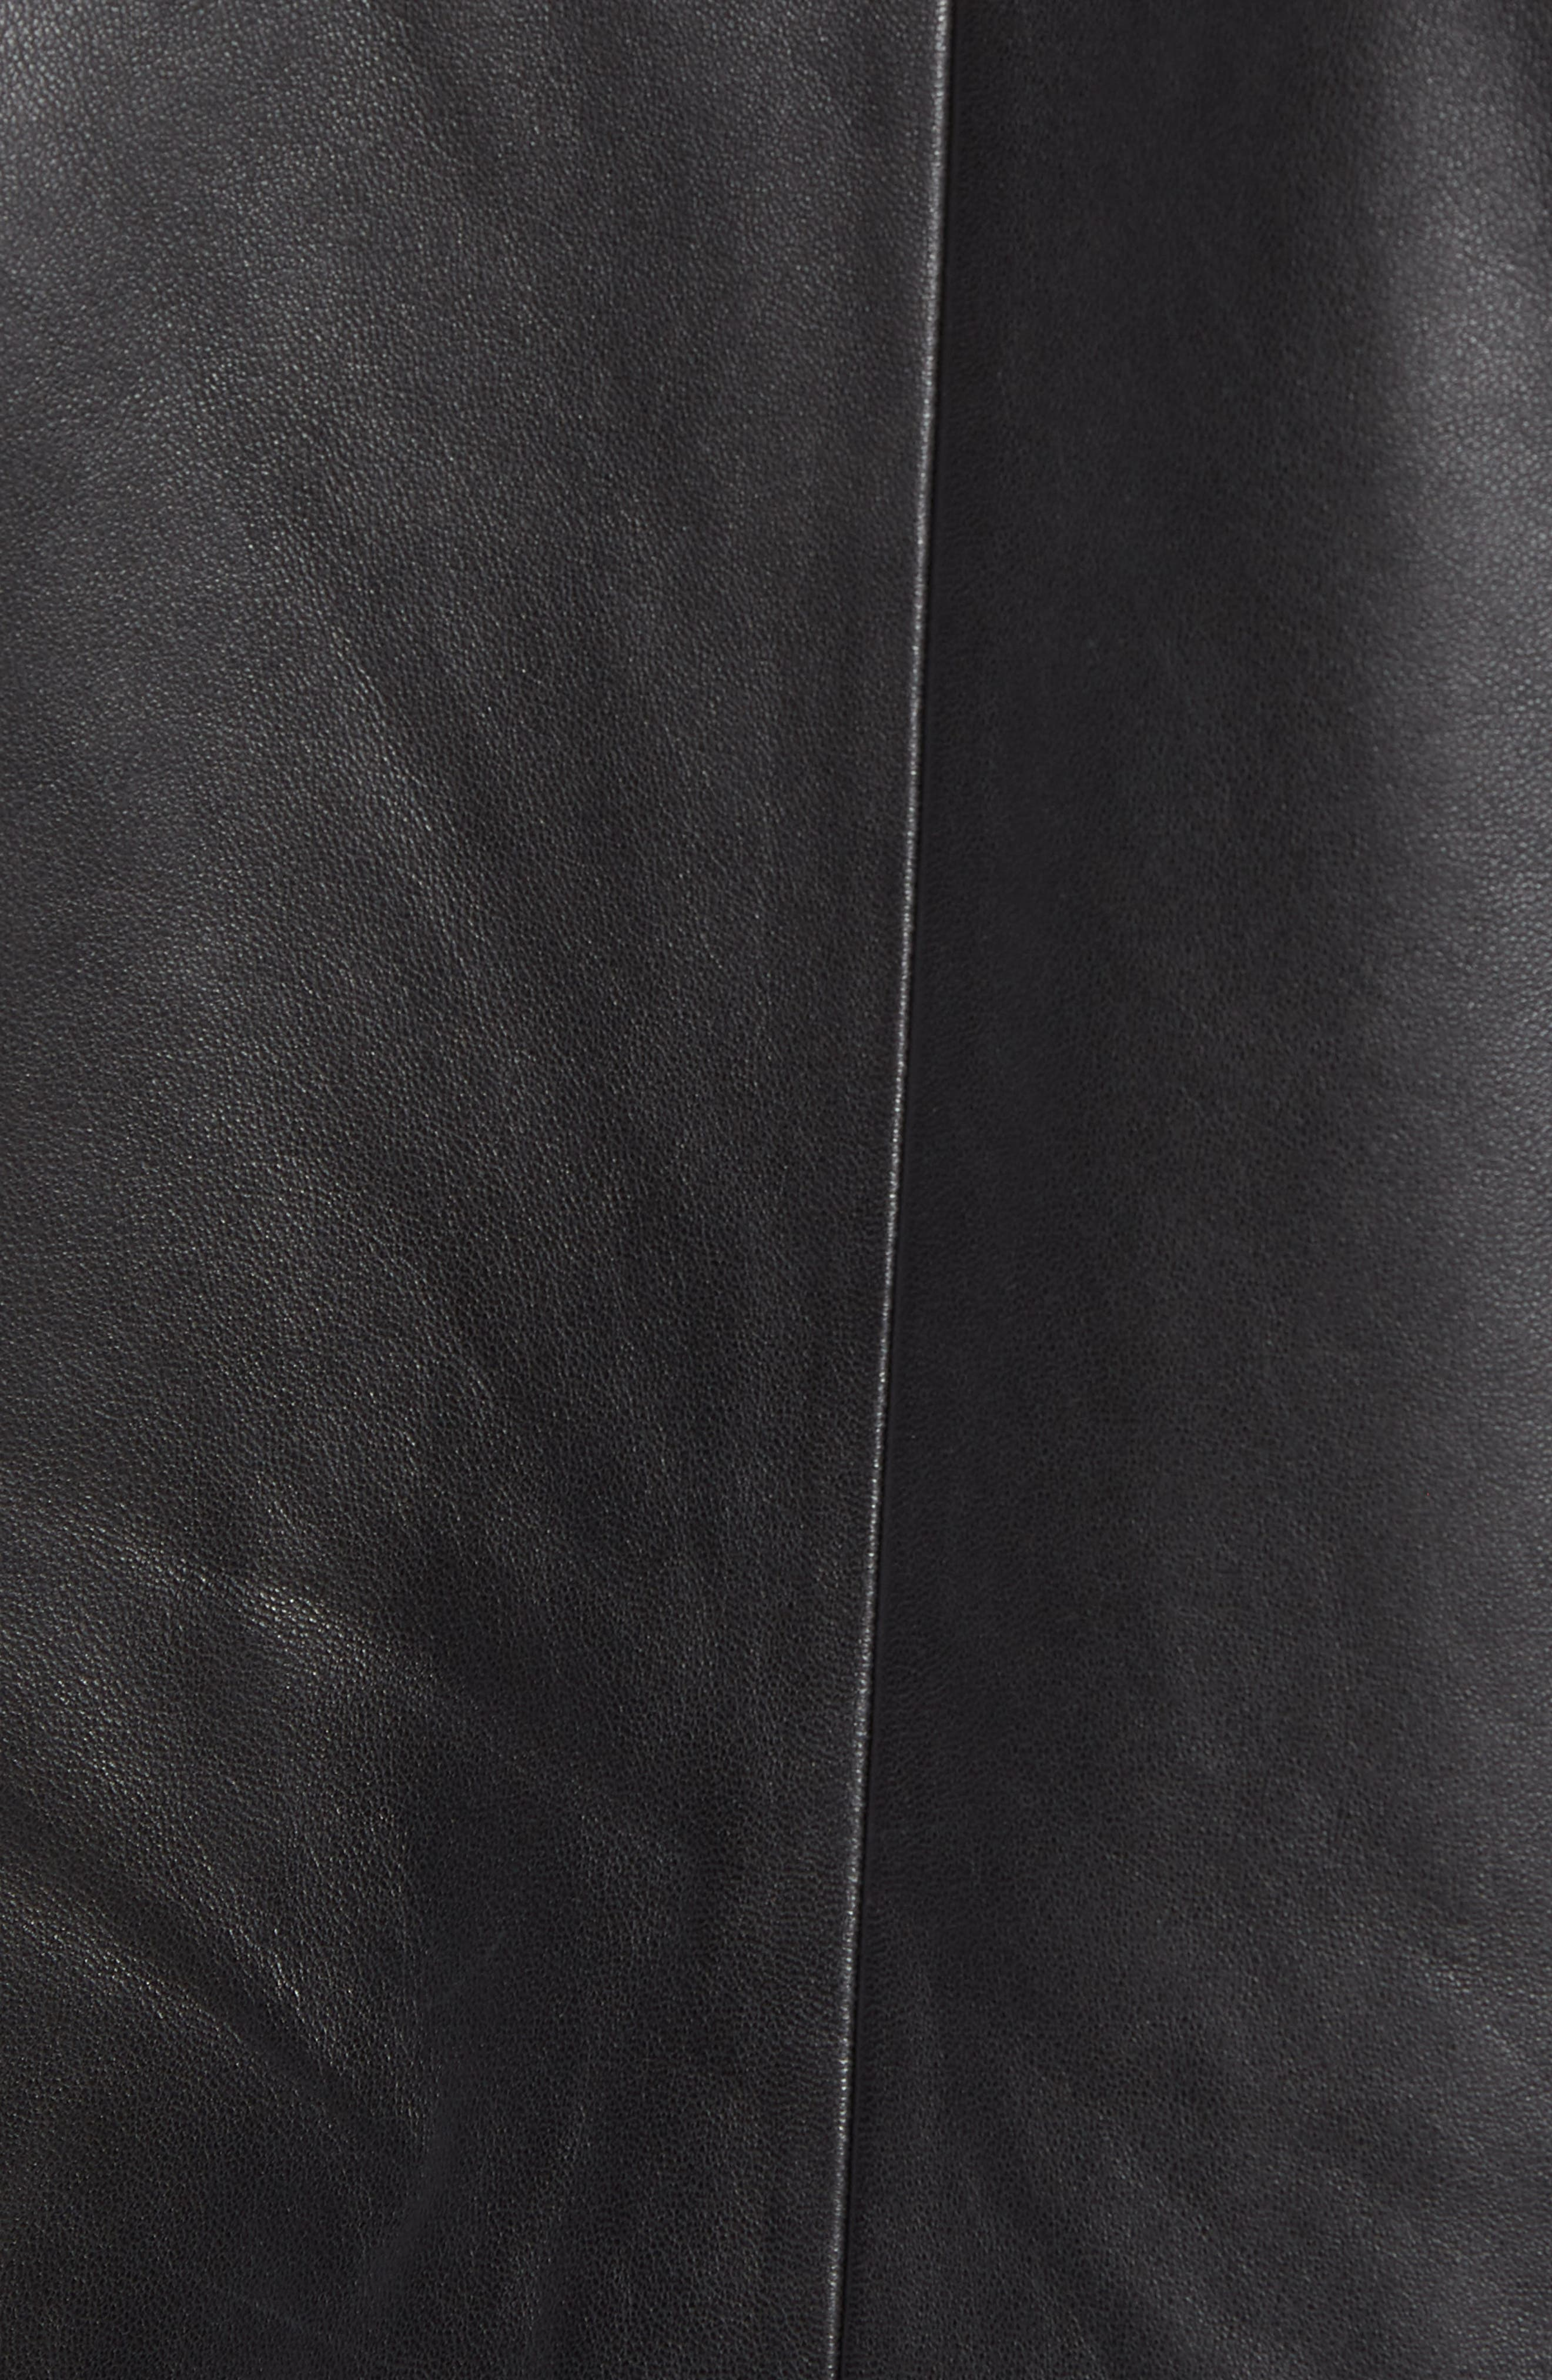 Leather Moto Jacket,                             Alternate thumbnail 7, color,                             001